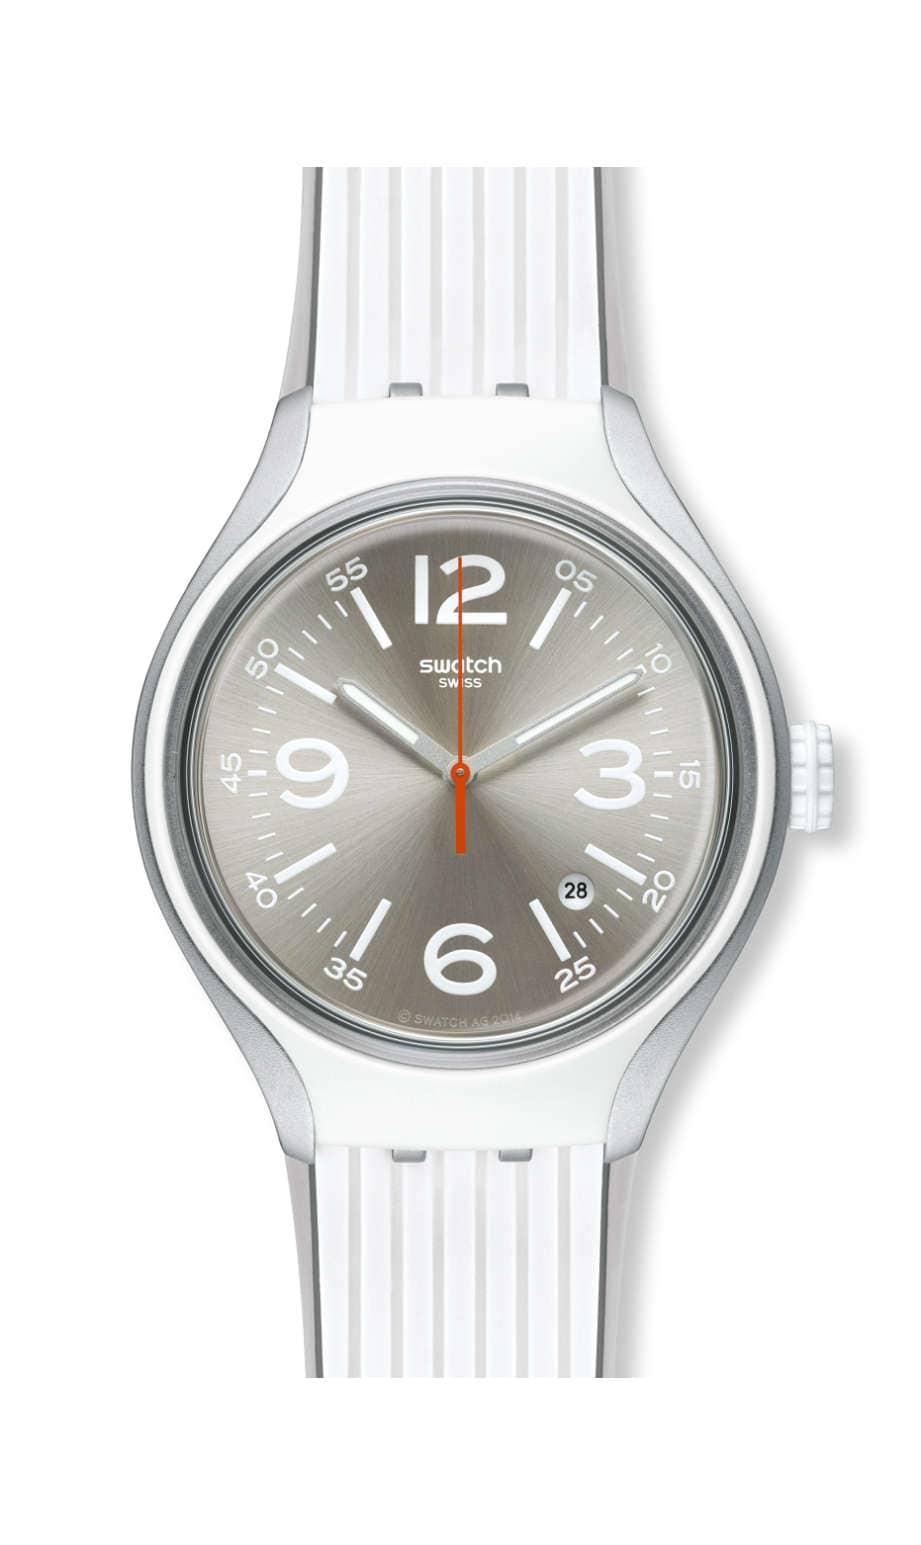 Swatch - GO DANCE - 1